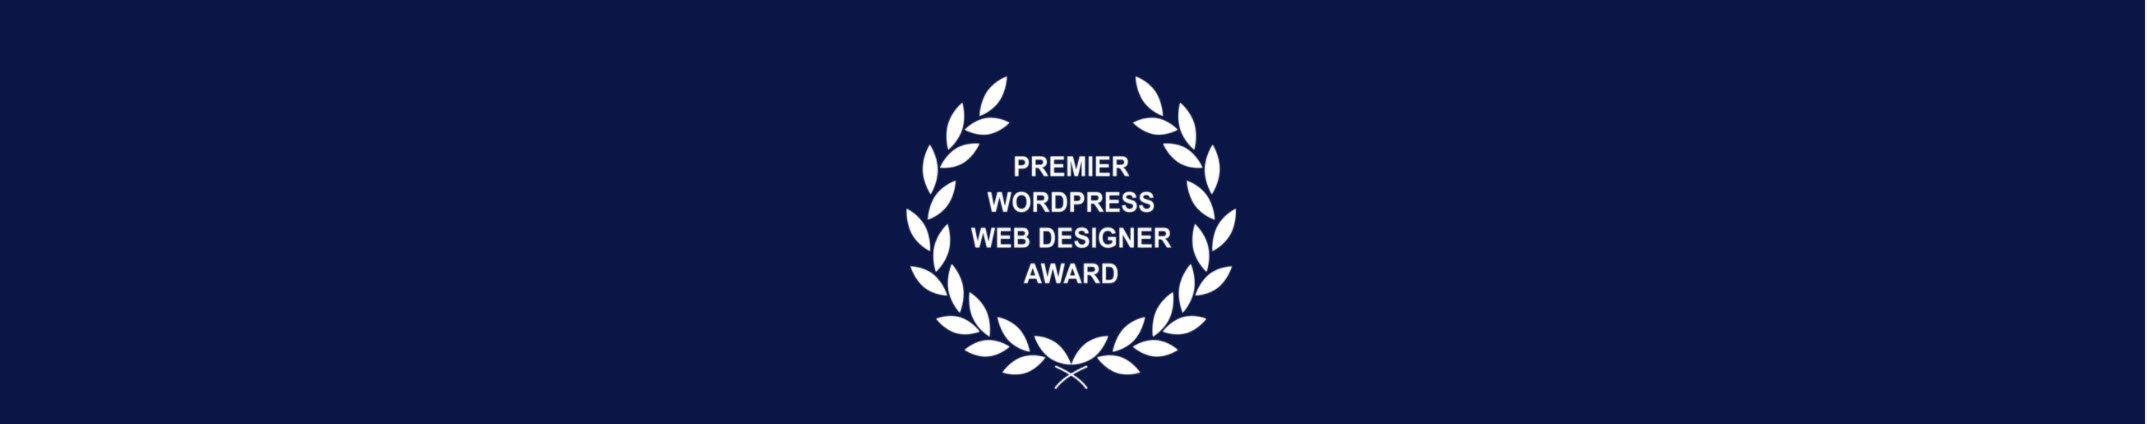 designer-award